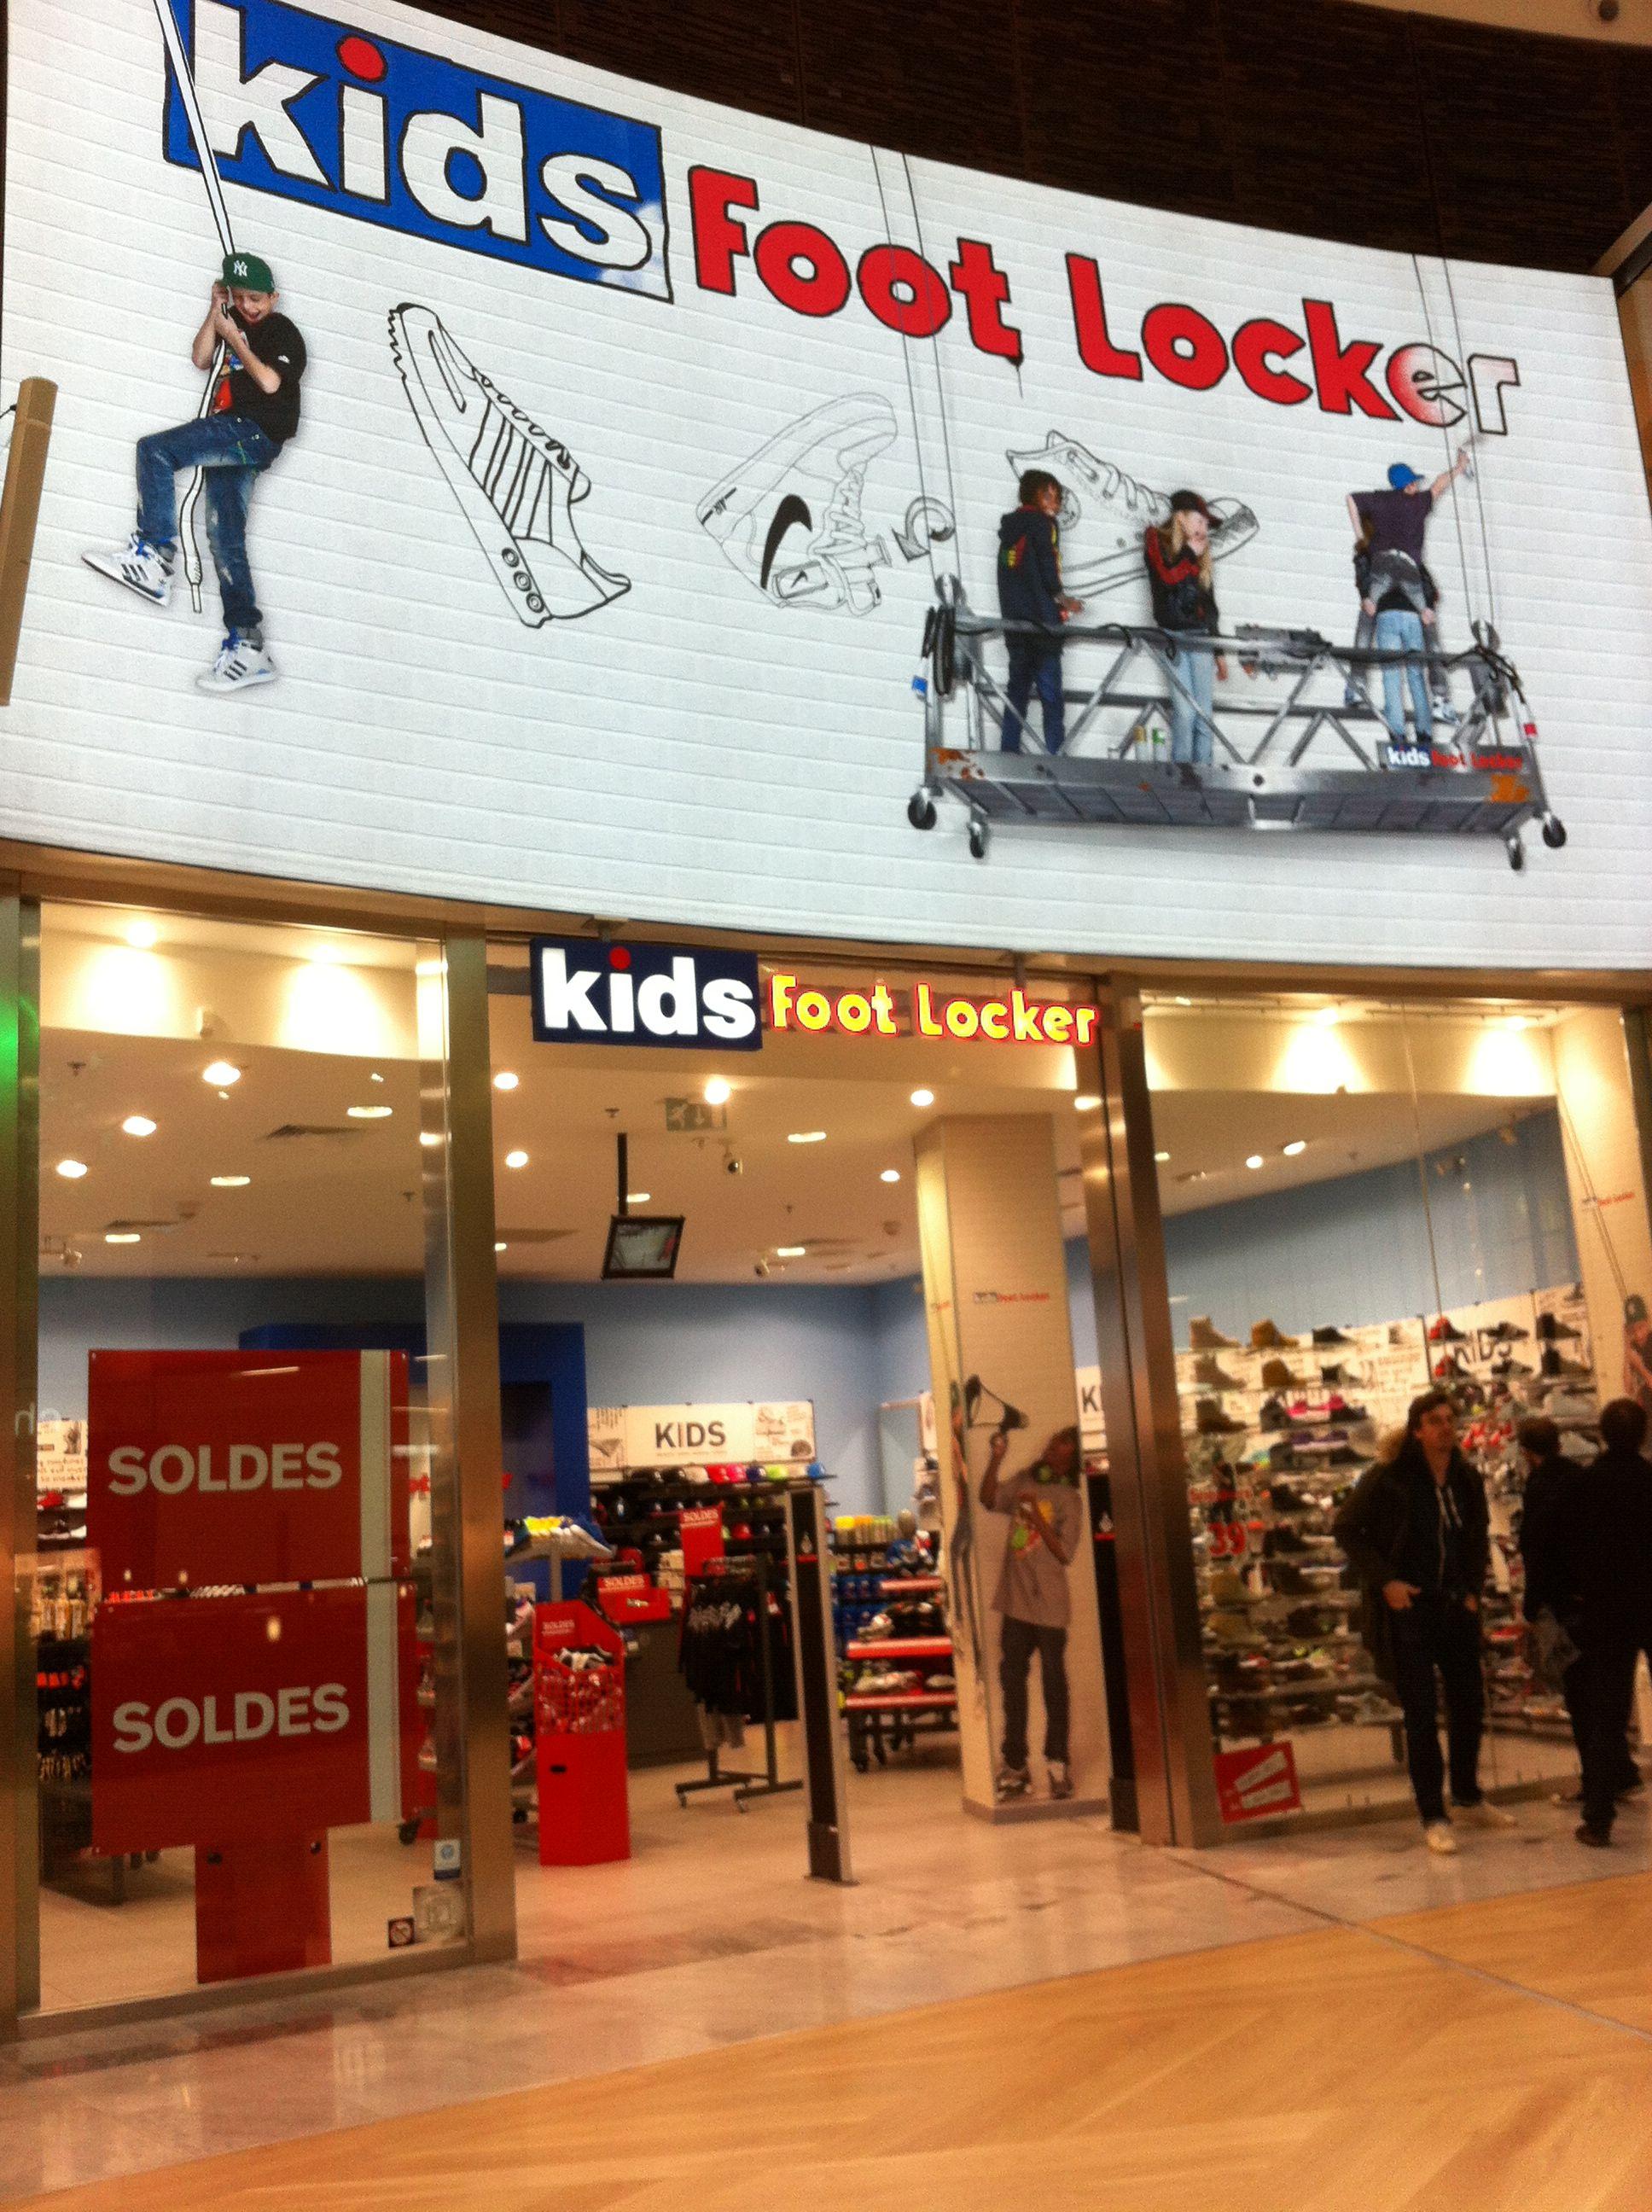 acheter populaire 246b5 a0385 KIDS FOOT LOCKER   Hobbies   Broadway shows, Lockers, Broadway